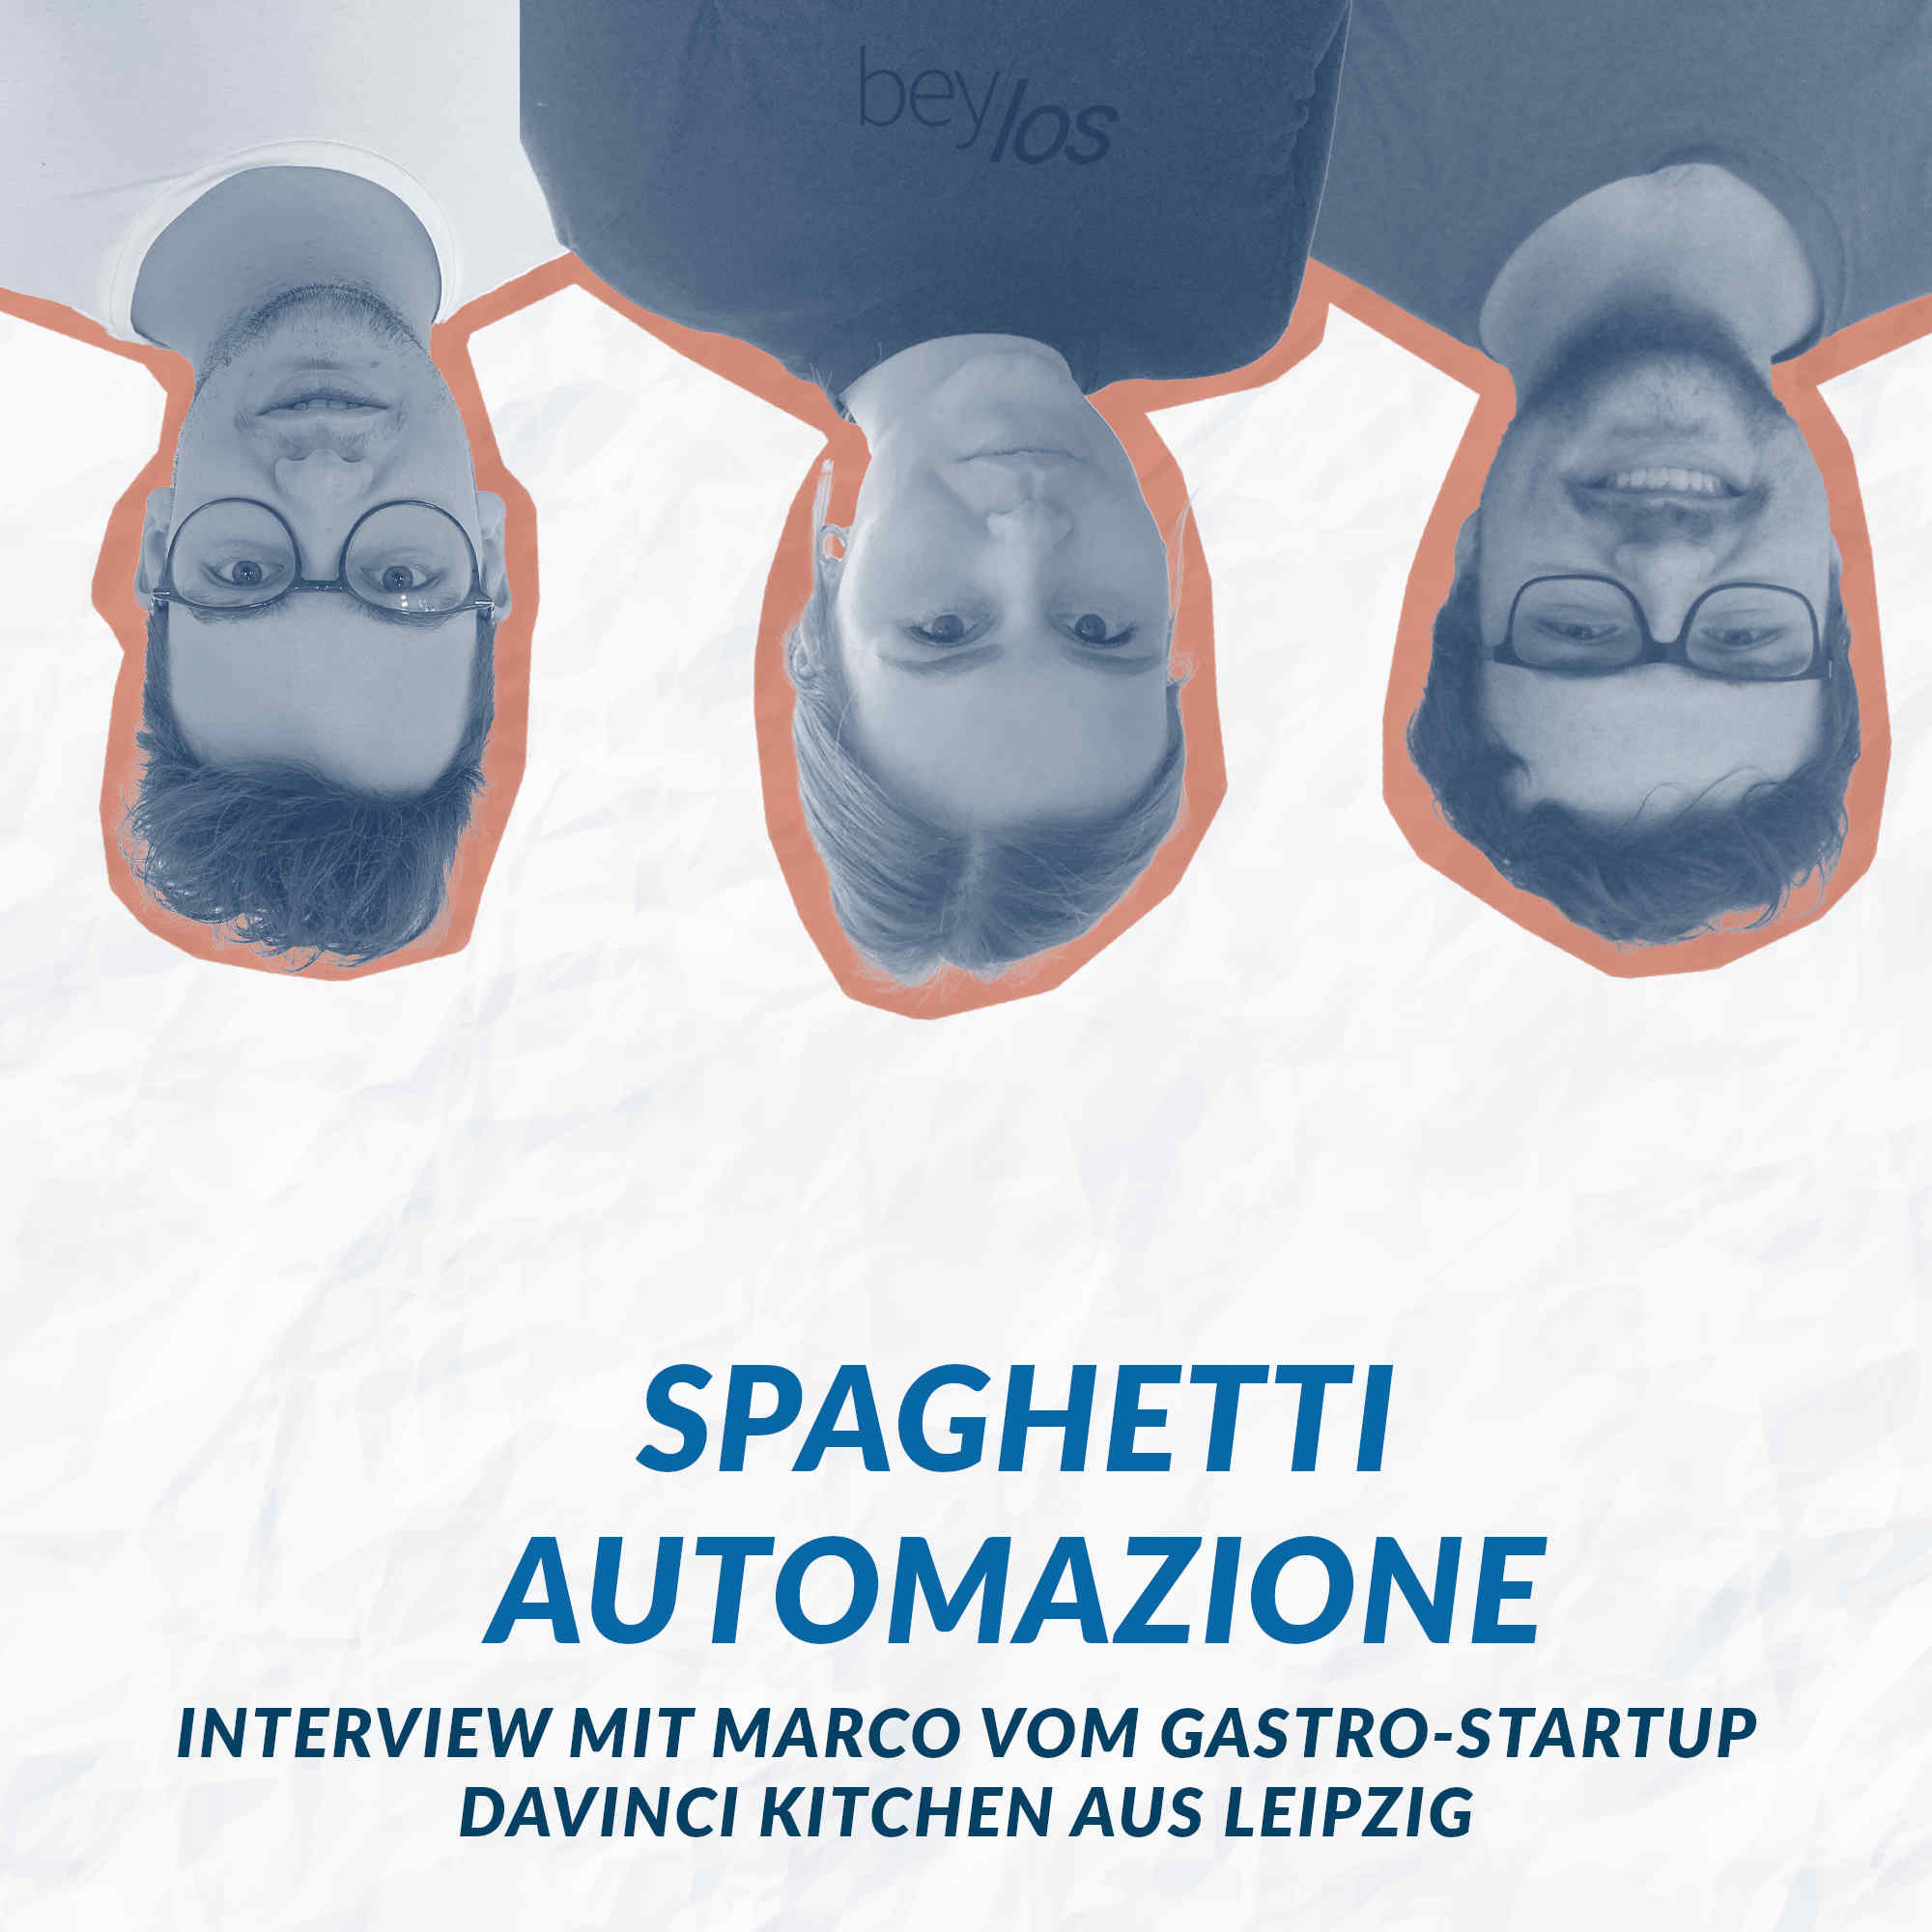 Spaghetti Automazione – Interview mit Marco von DaVinci Kitchen